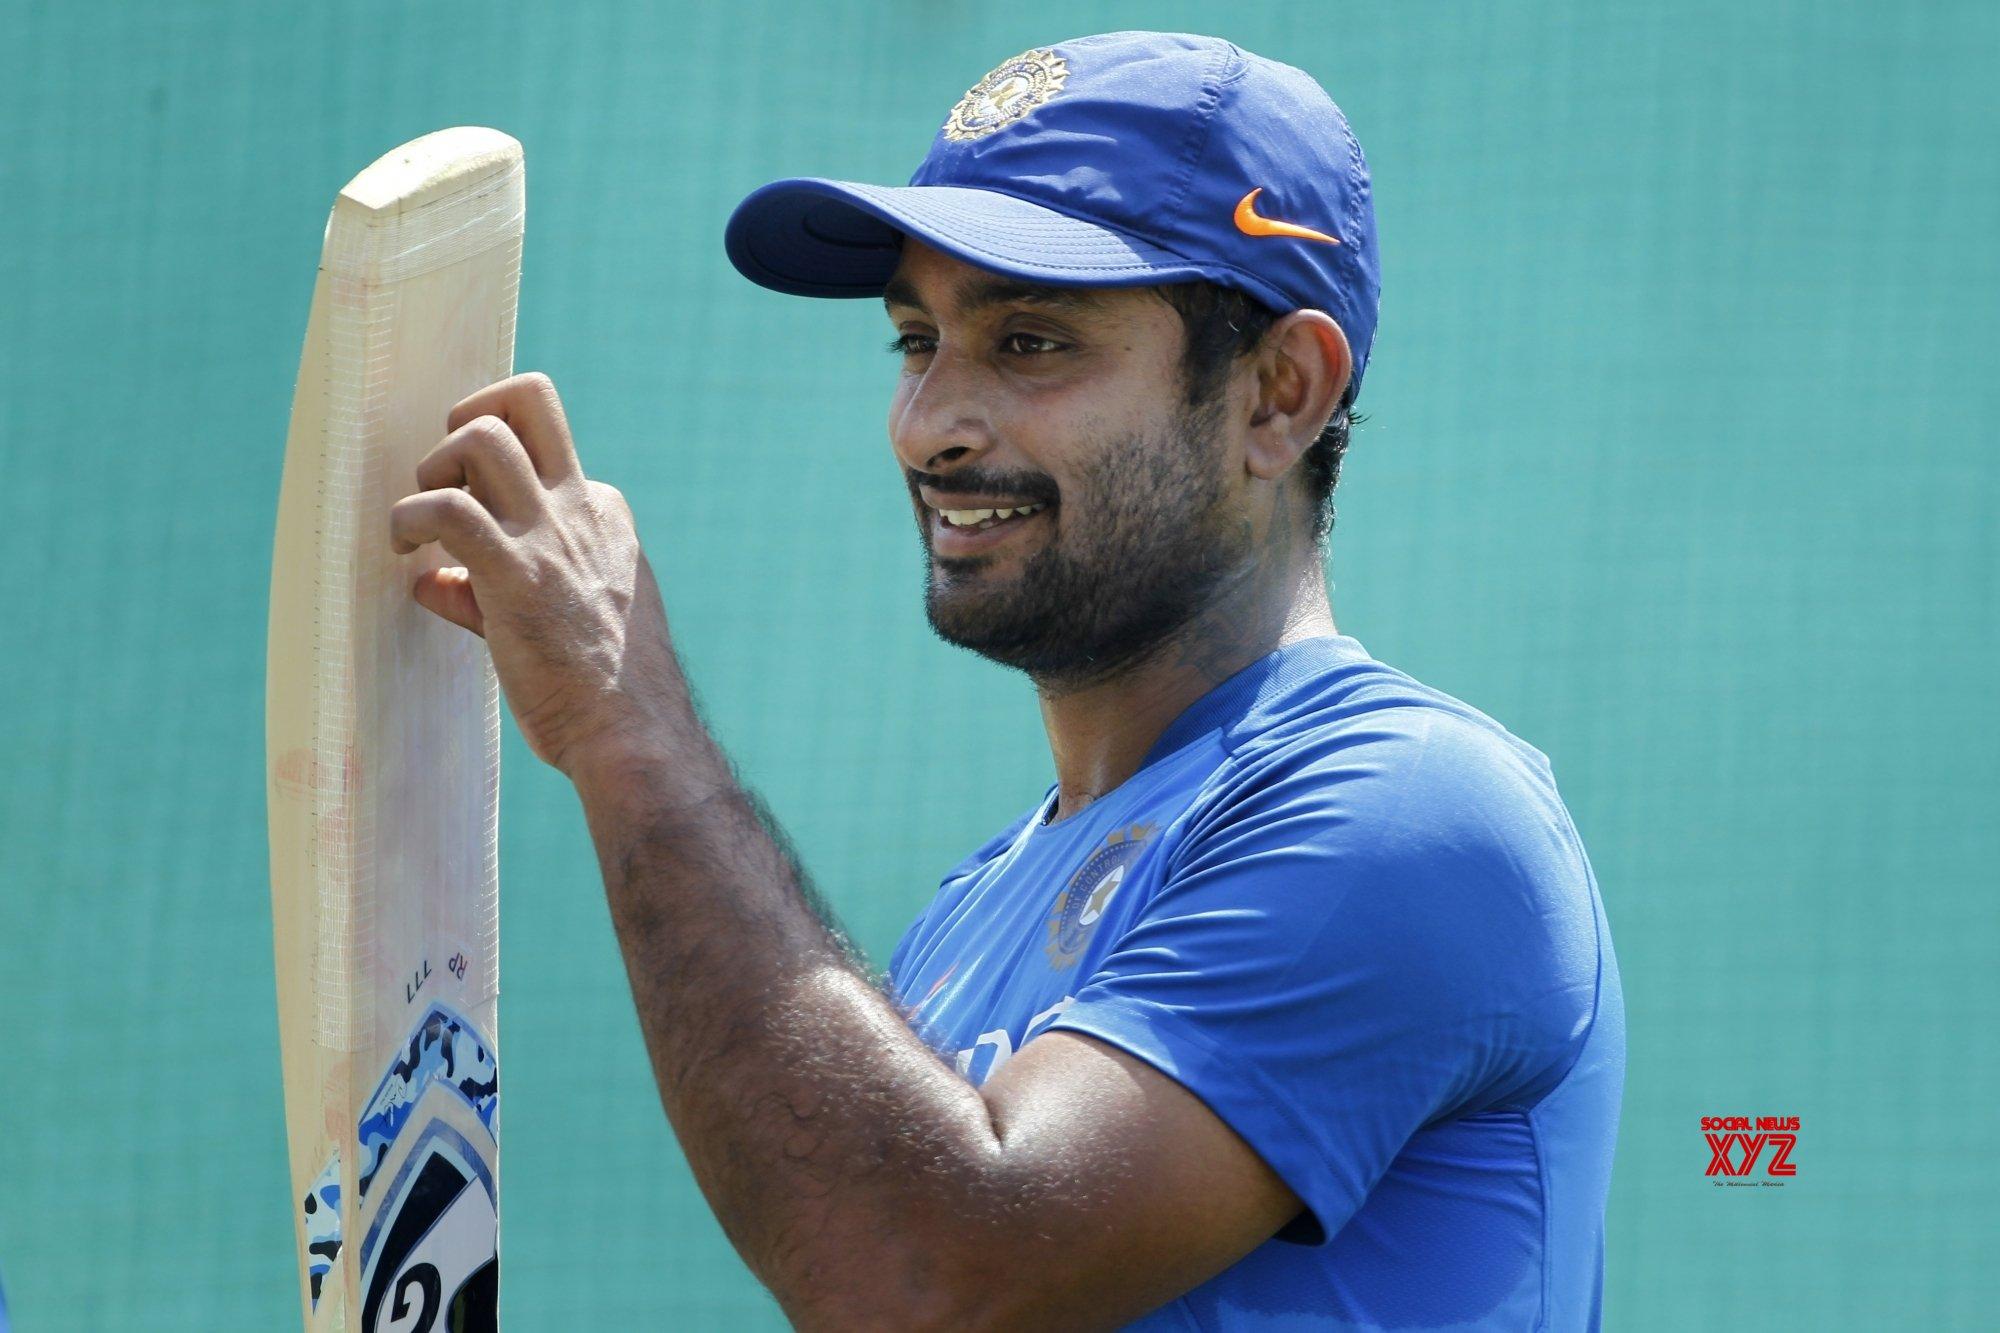 Rayudu reacts to World Cup snub in social media